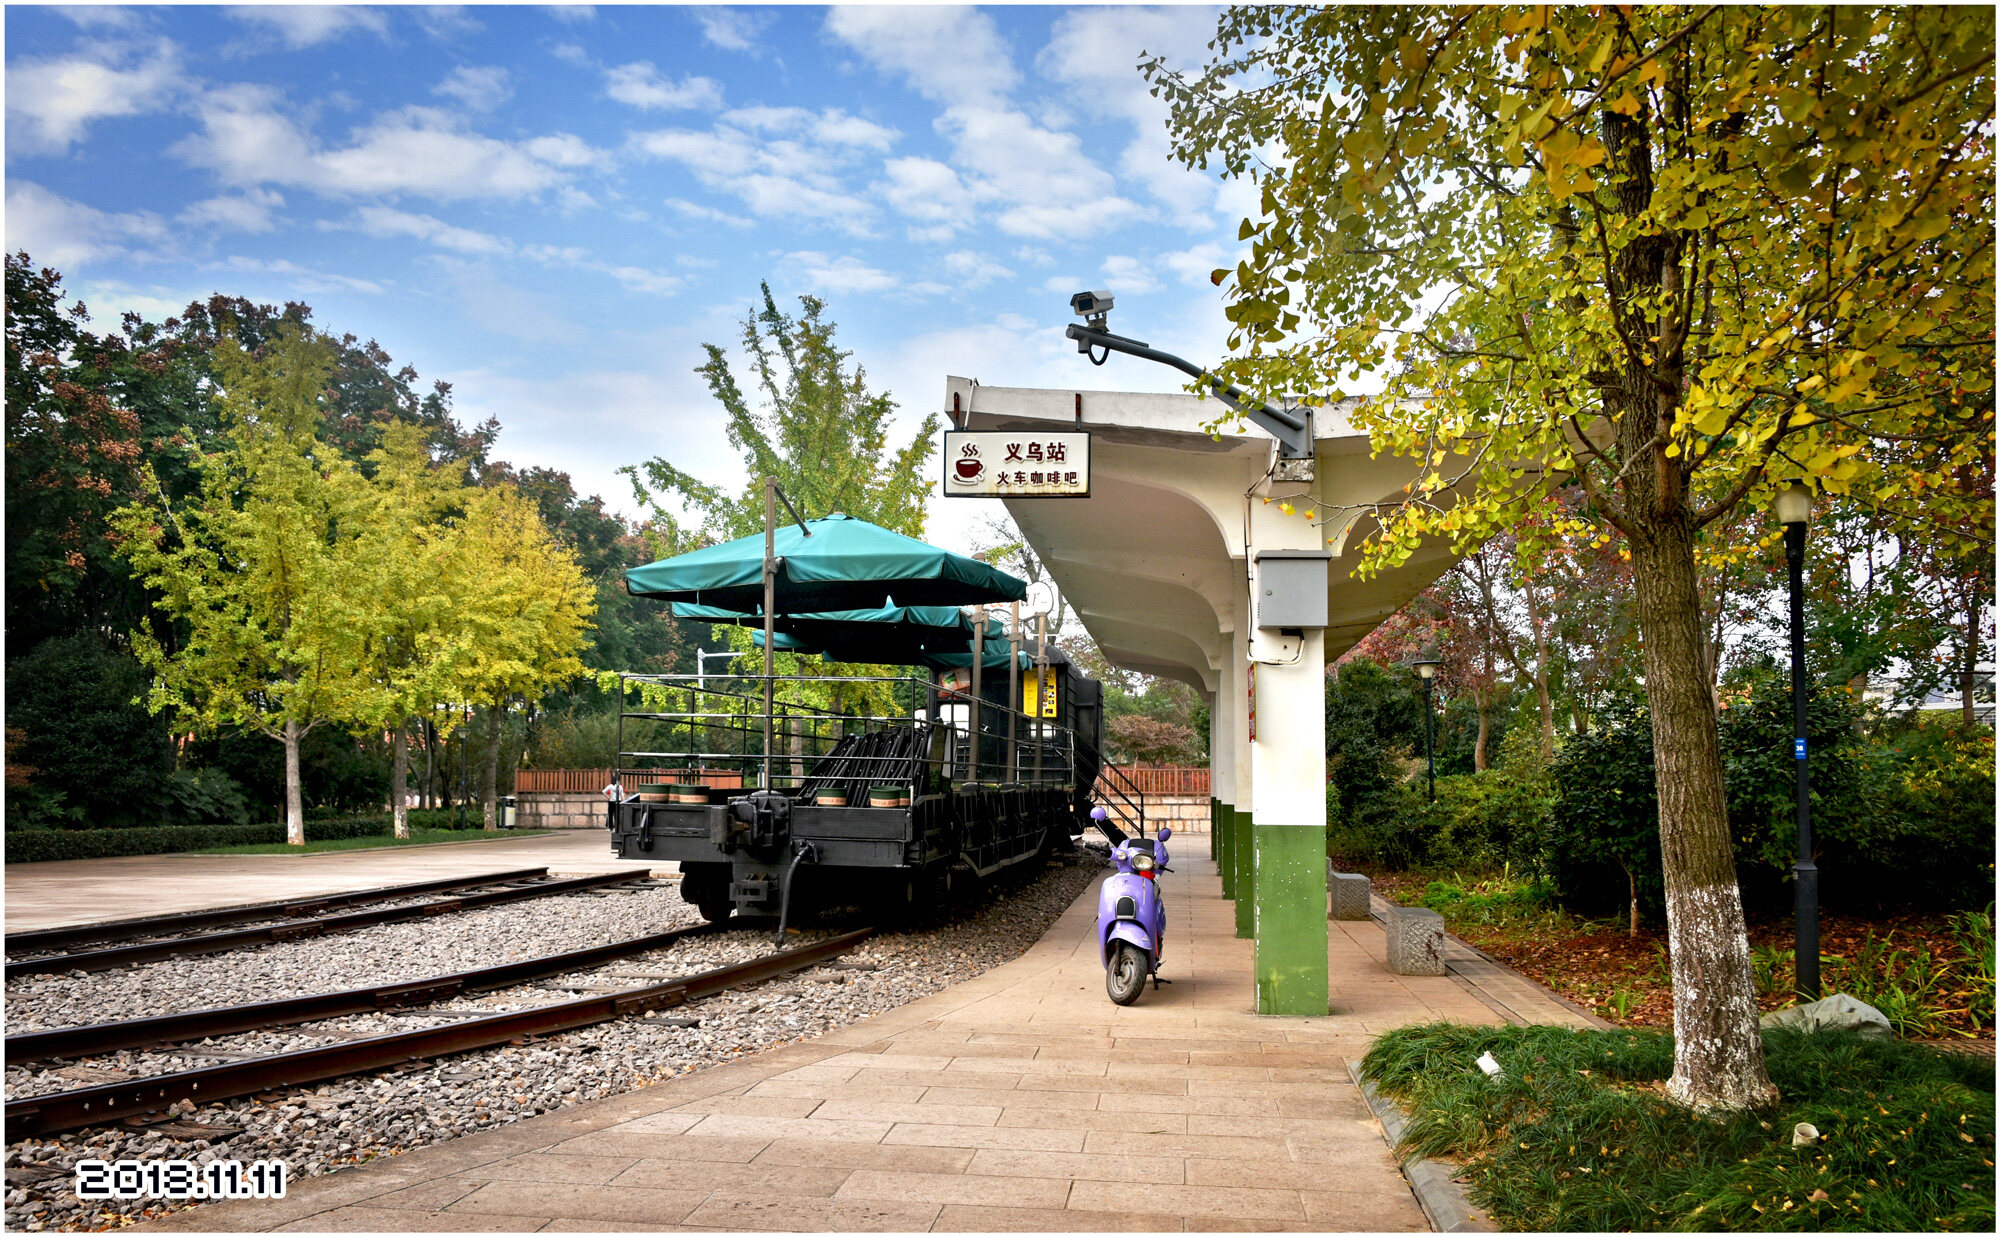 DSC_4240火车头公园 2.jpg